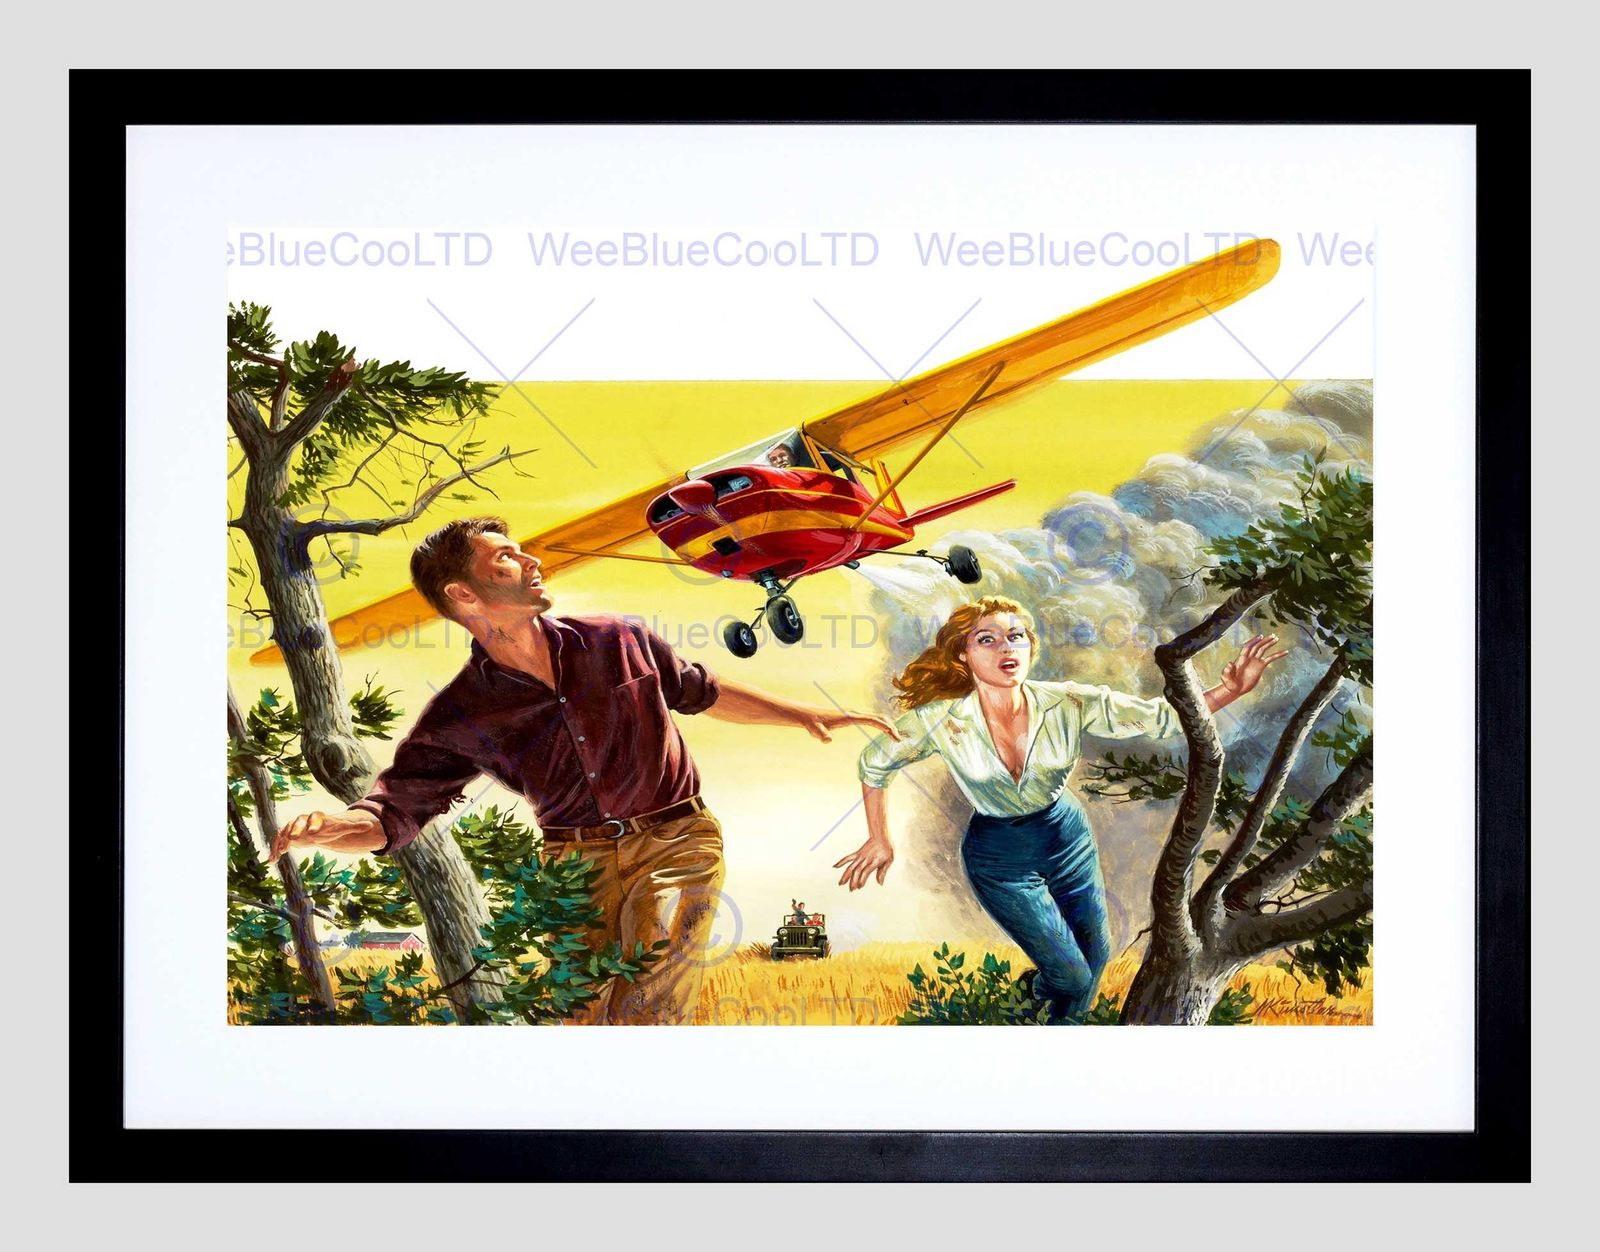 85808 FANTASY CROP DUSTING PLANE RUNNING COUPLE WEIRD Decor WALL ...